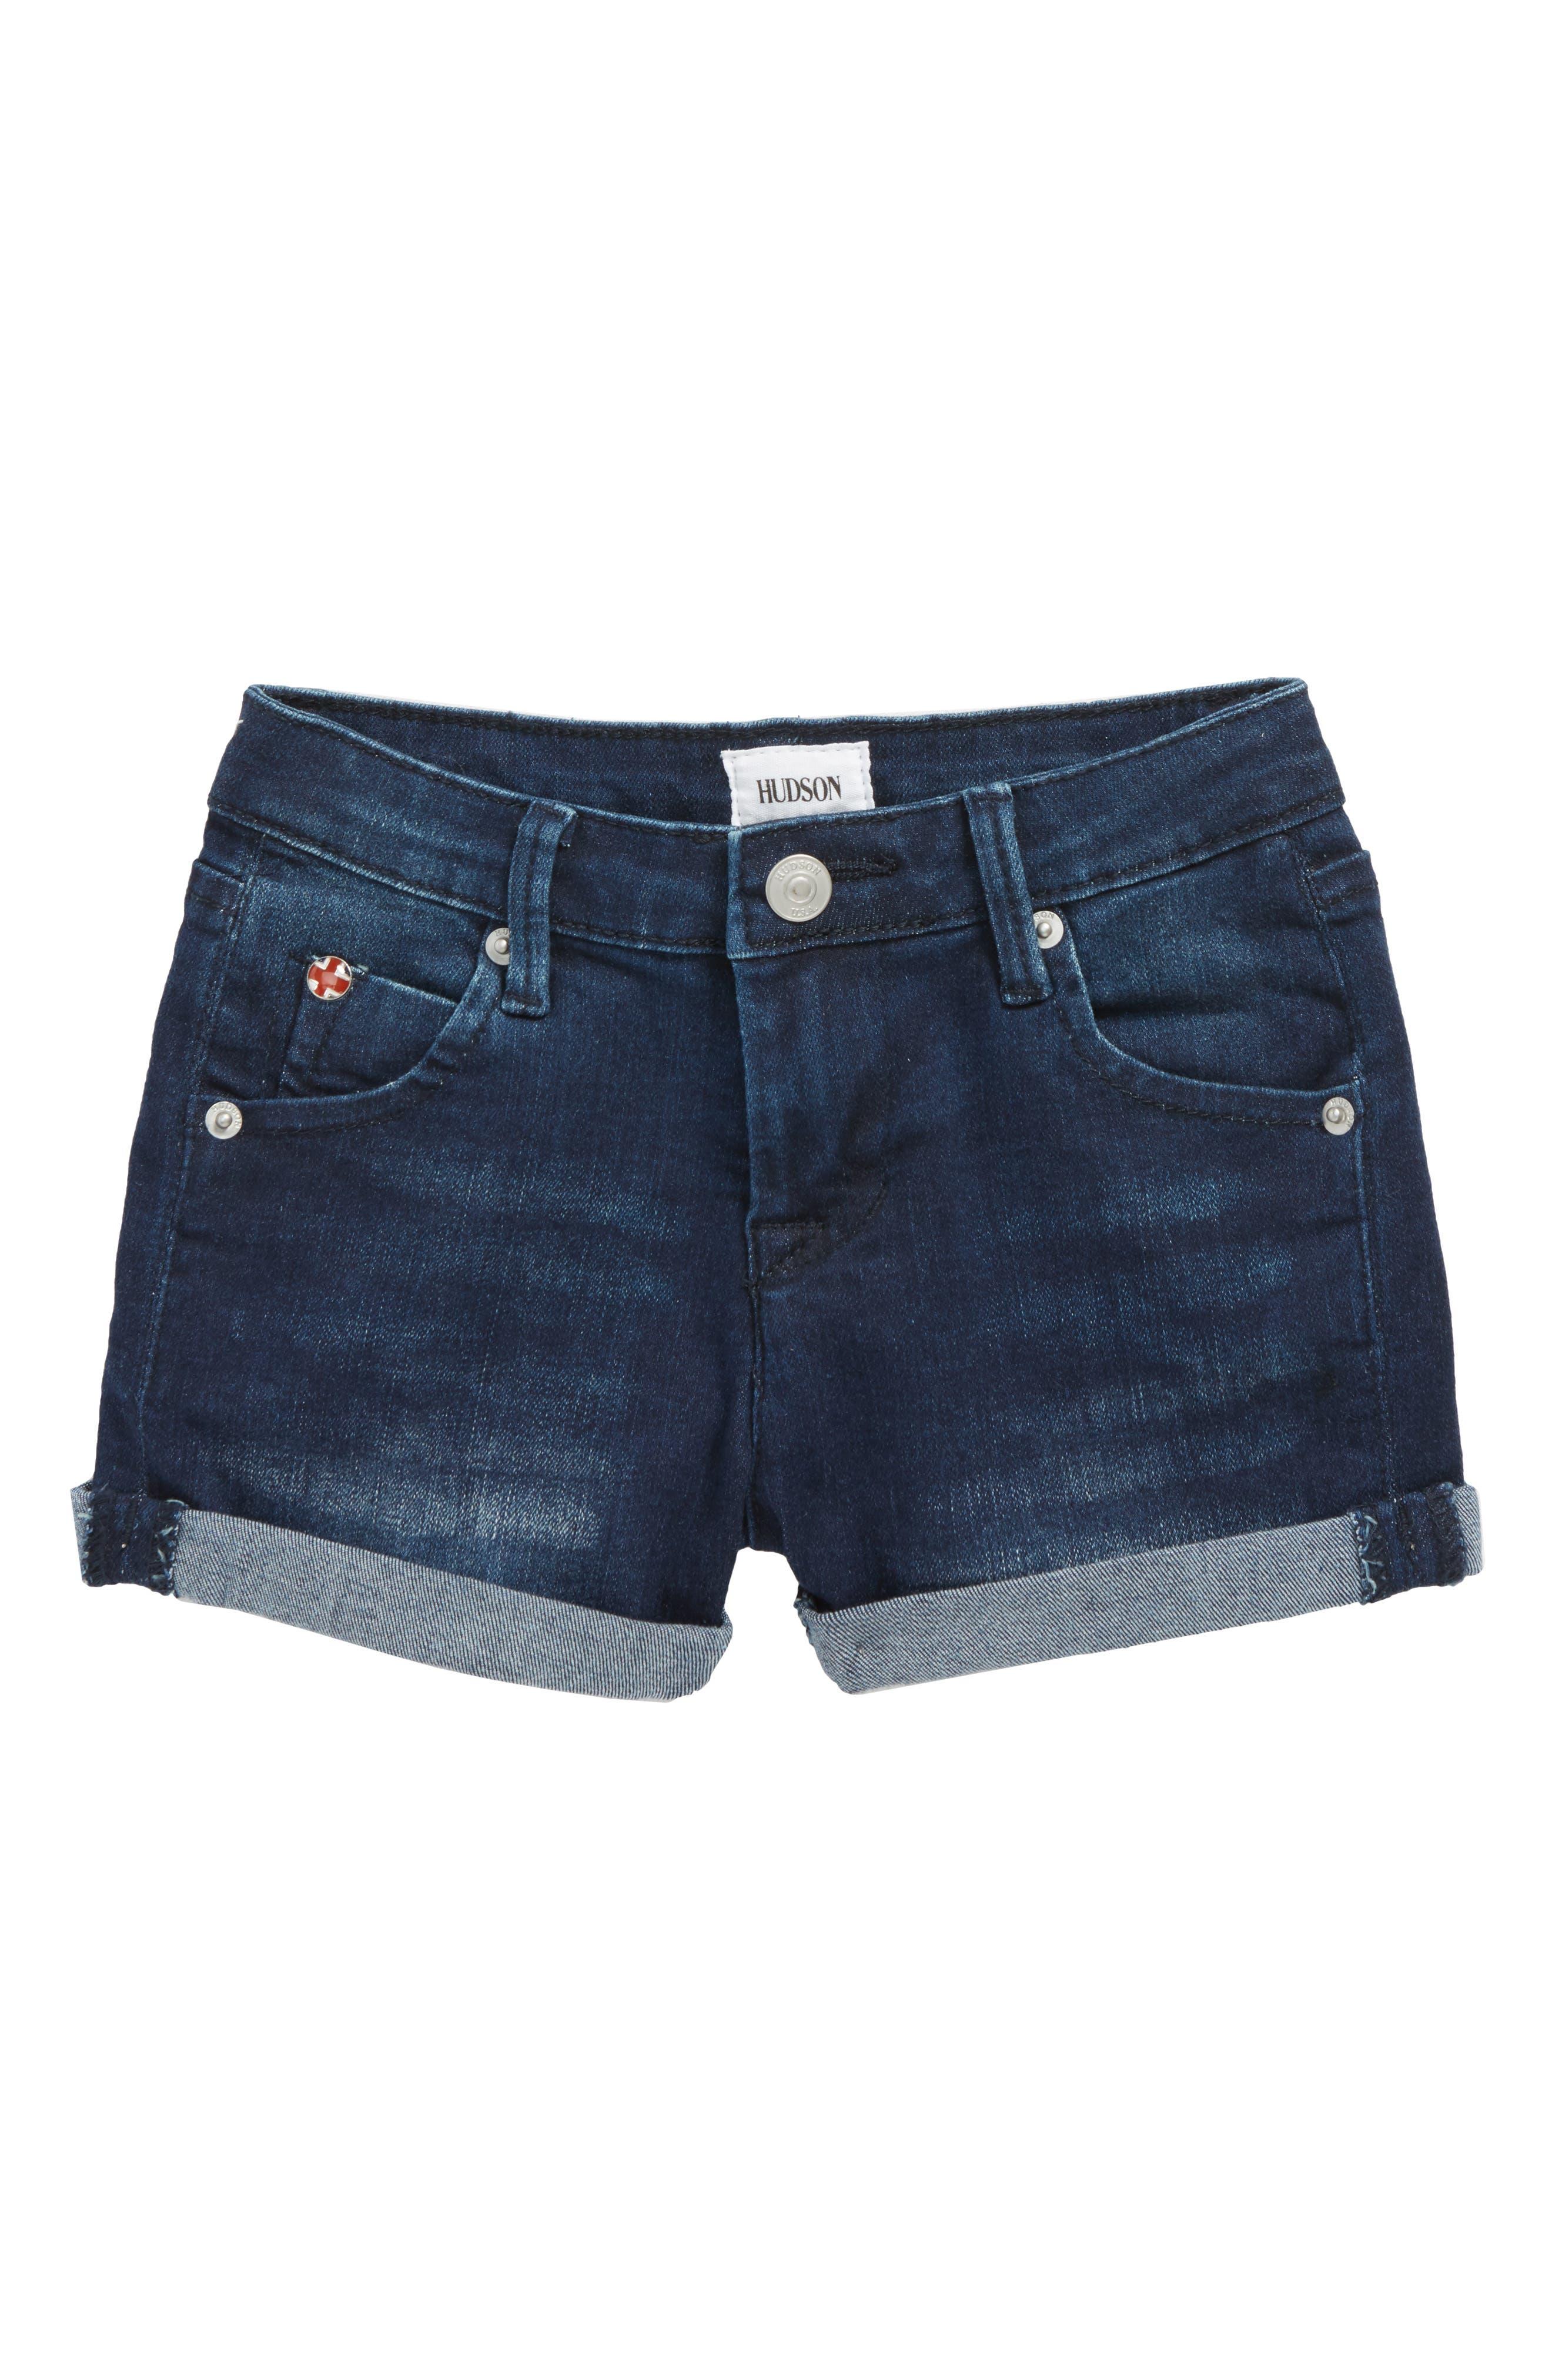 Roll Cuff Denim Shorts,                         Main,                         color, Low Octane Blue